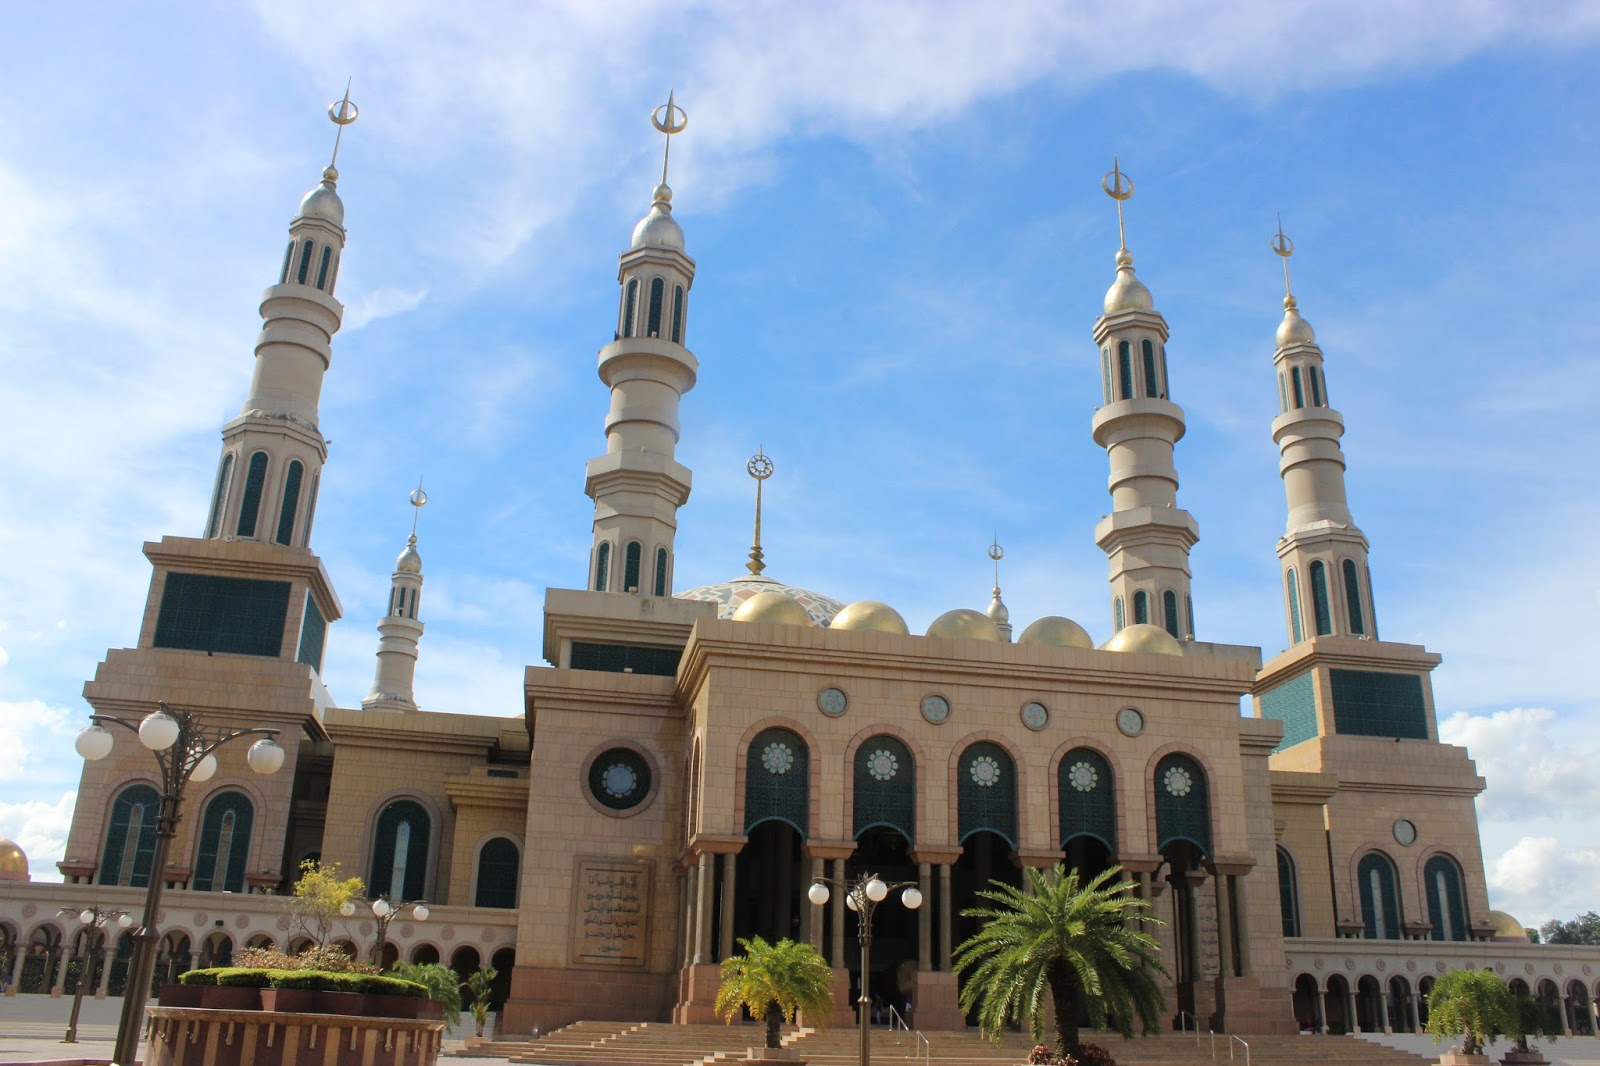 Masjid Baitul Muttaqien Terbesar Ketiga Se Asean Kebanggan Kaltim Kota